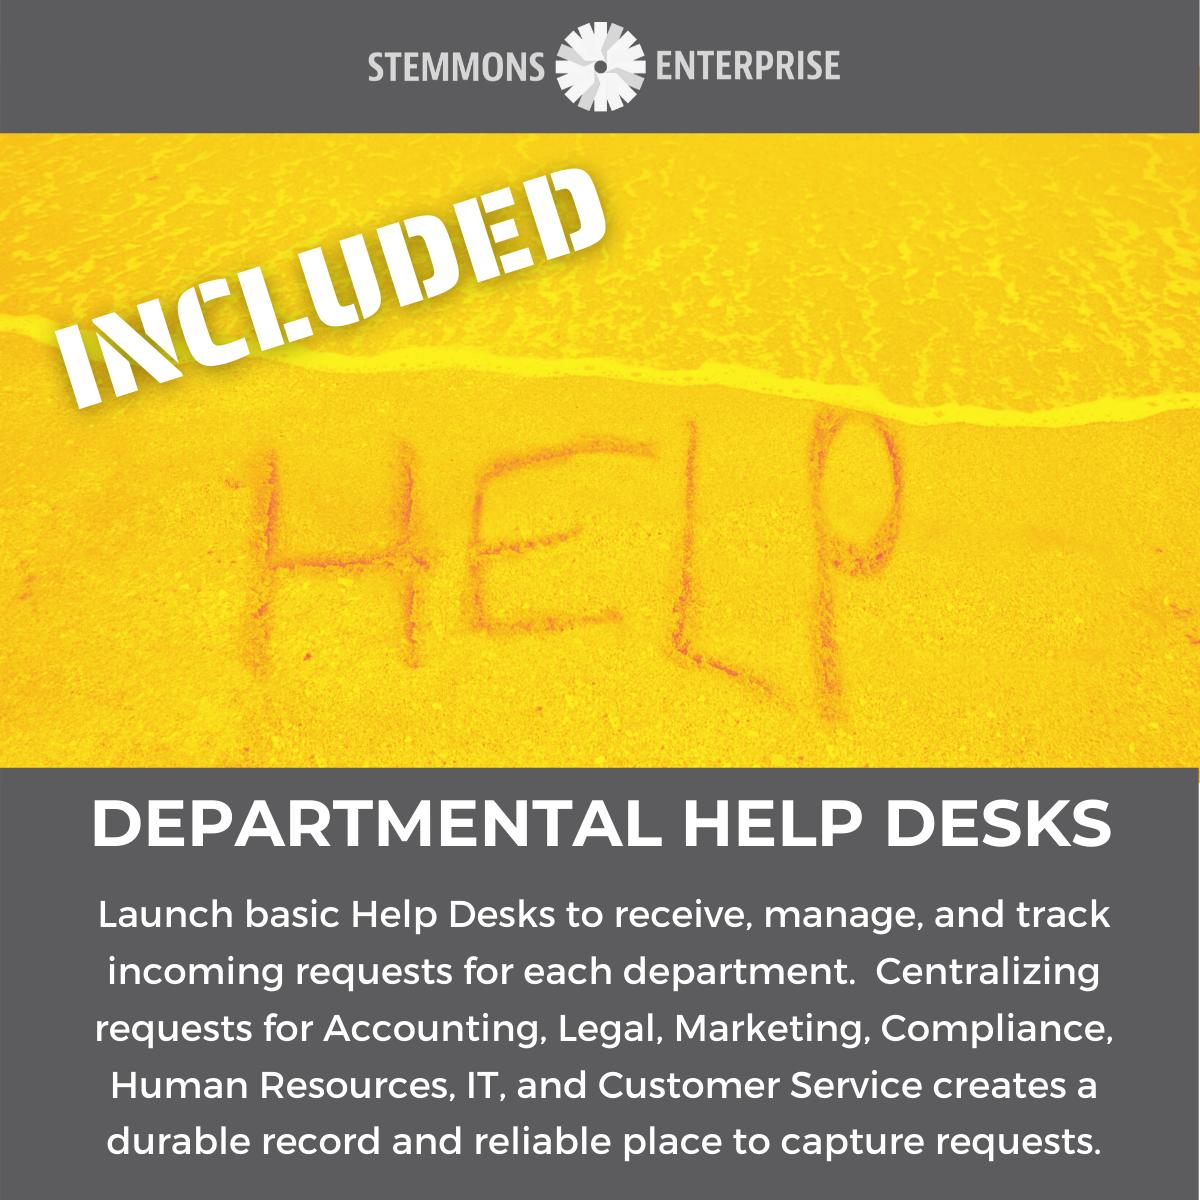 Departmental Help Desks